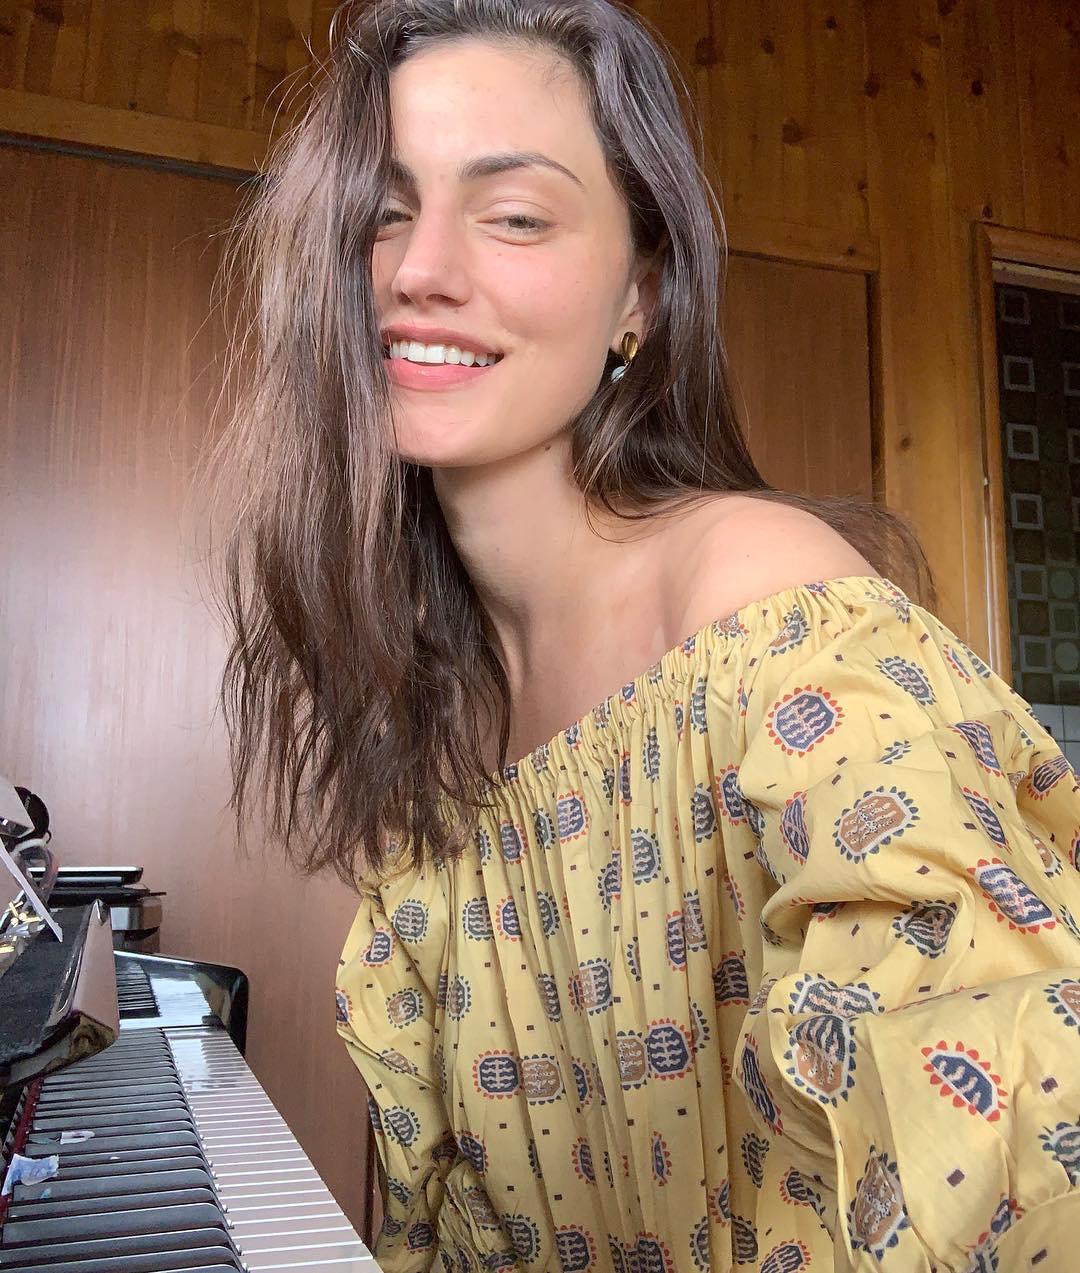 Phoebe-Tonkin-Wallpapers-Insta-Fit-Bio-2